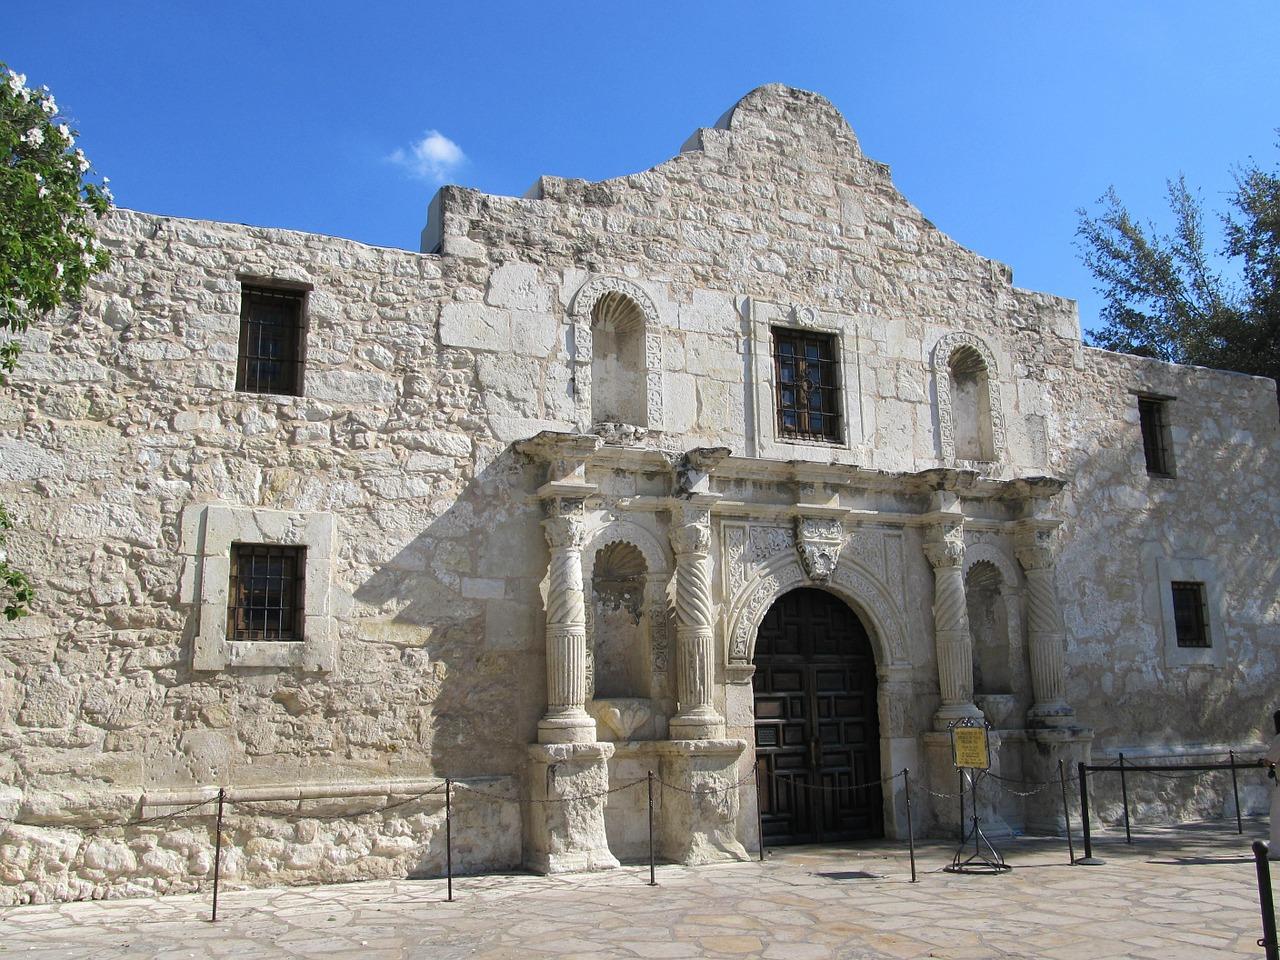 Misiunea Alamo1